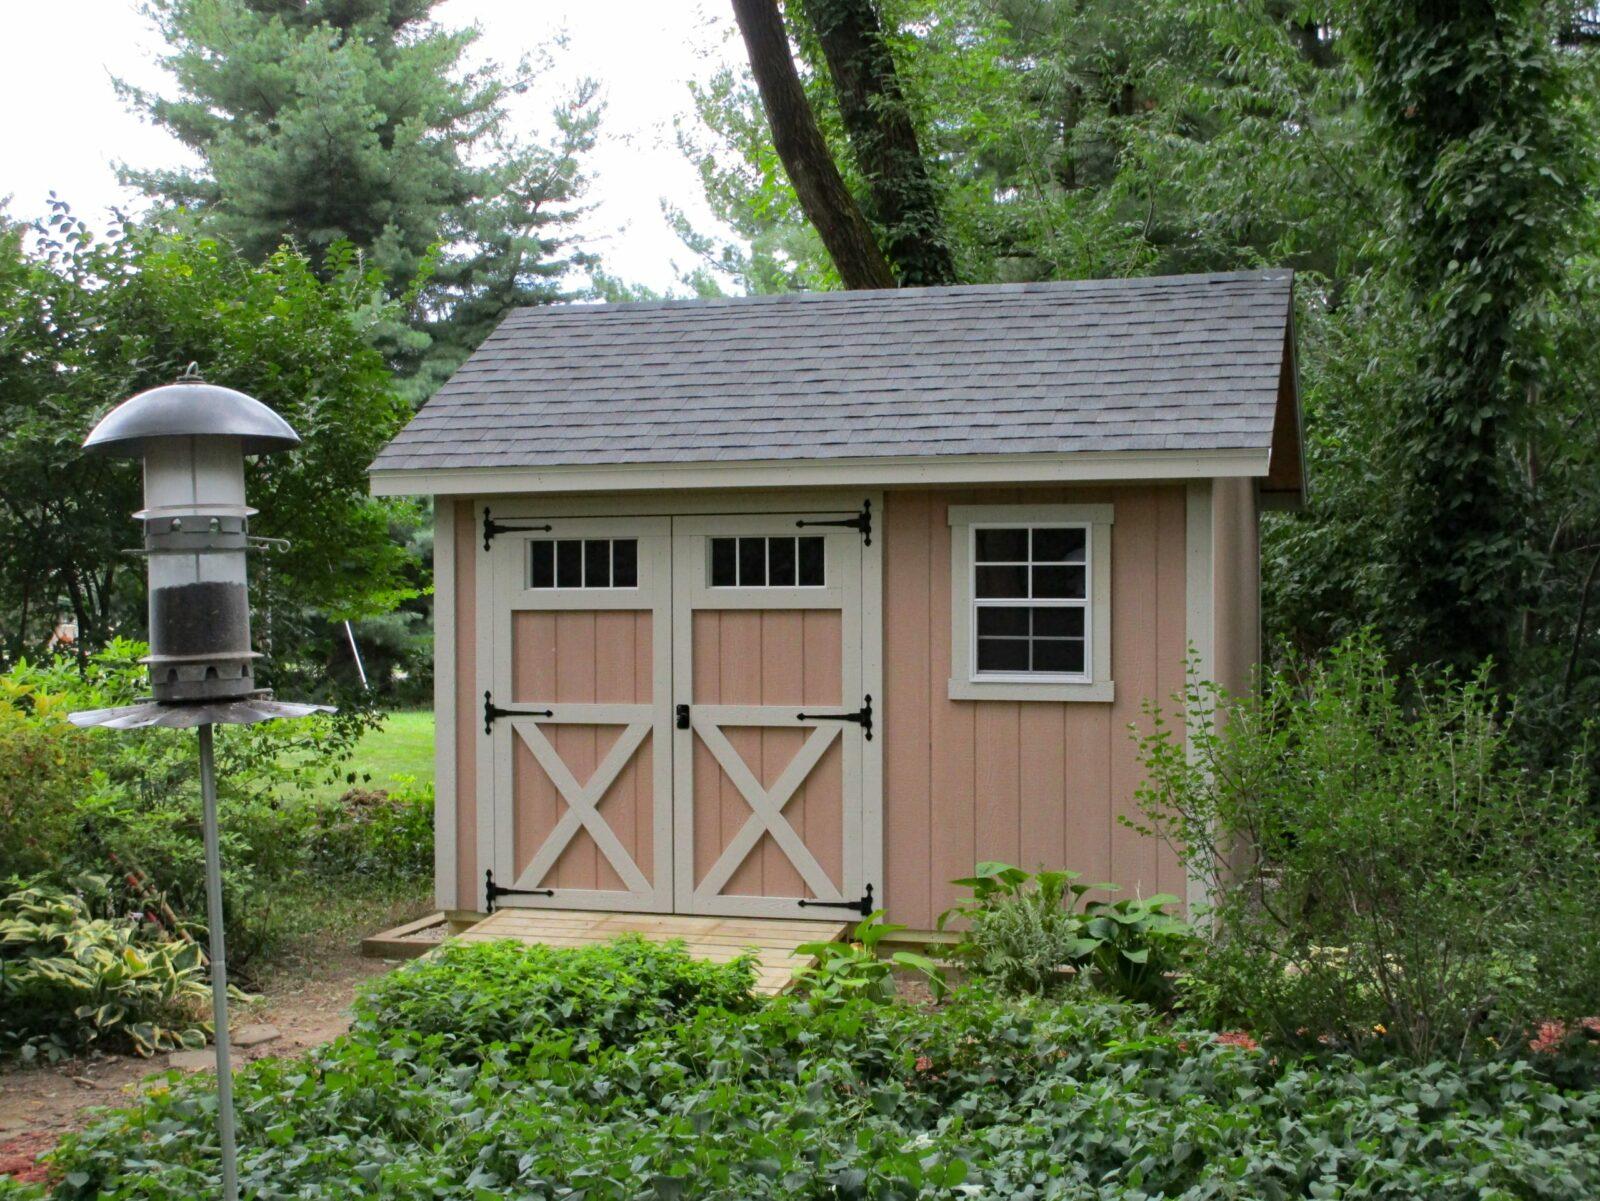 cape cod garden shed for sale near dayton ohio